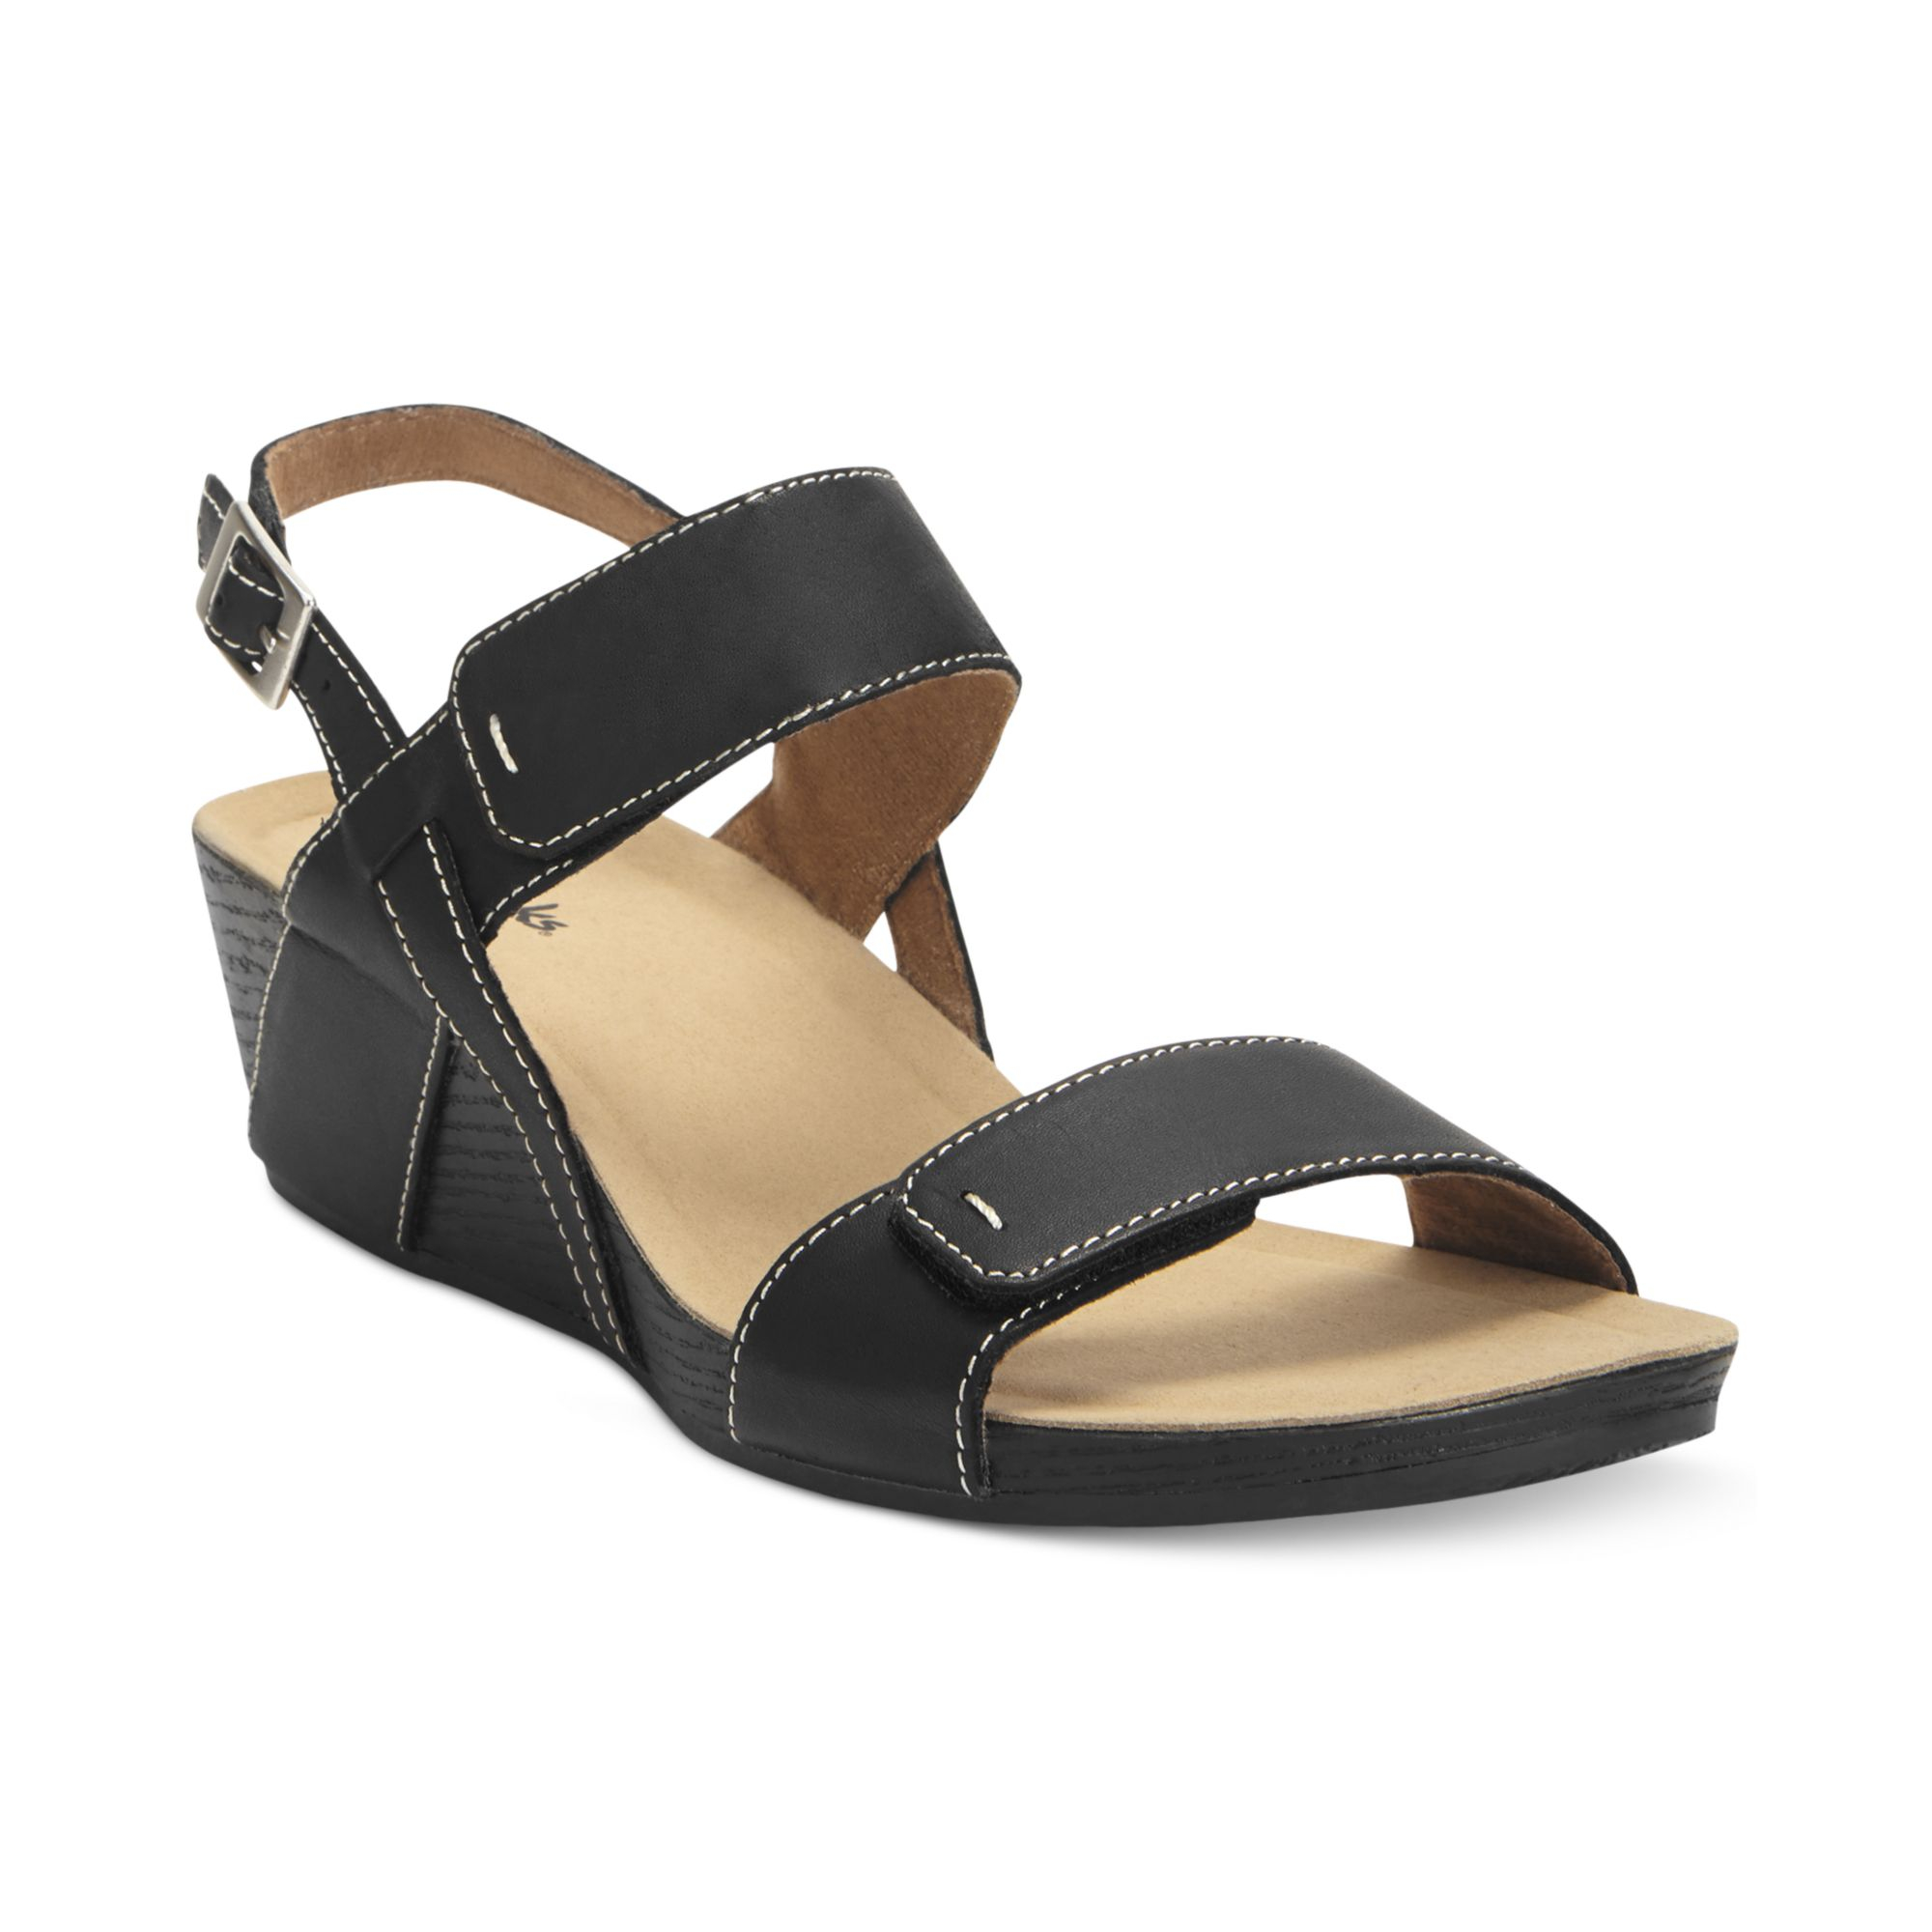 96ce2b5048a6 Lyst - Clarks Alto Disco Platform Wedge Sandals in Black